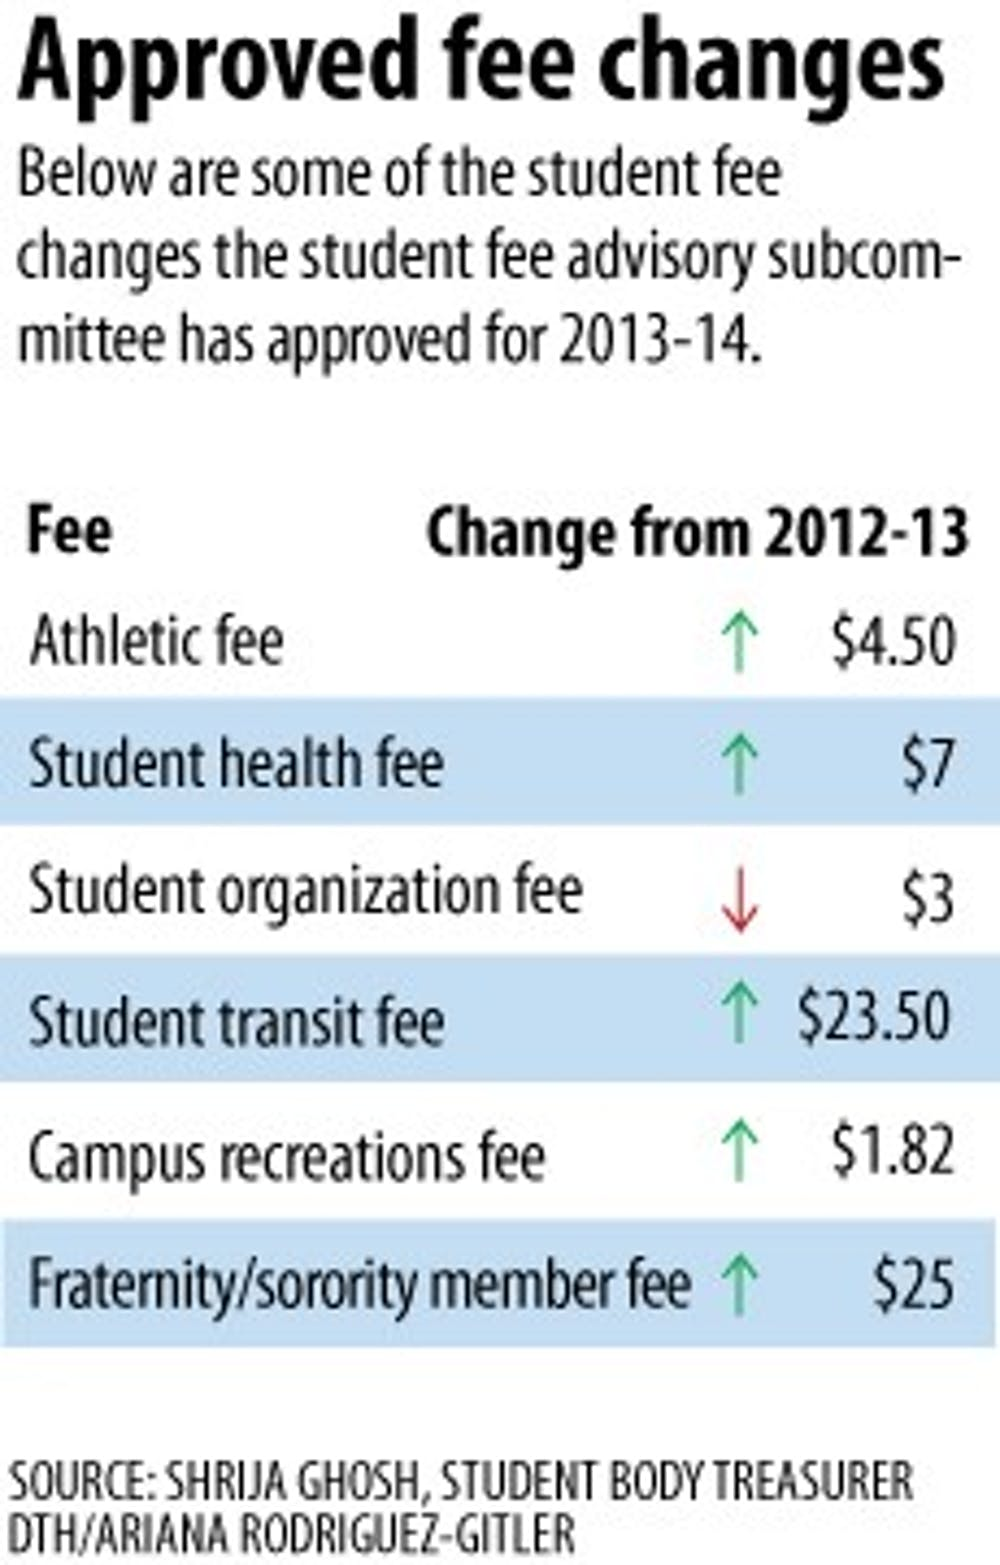 New $25 Greek fee passed